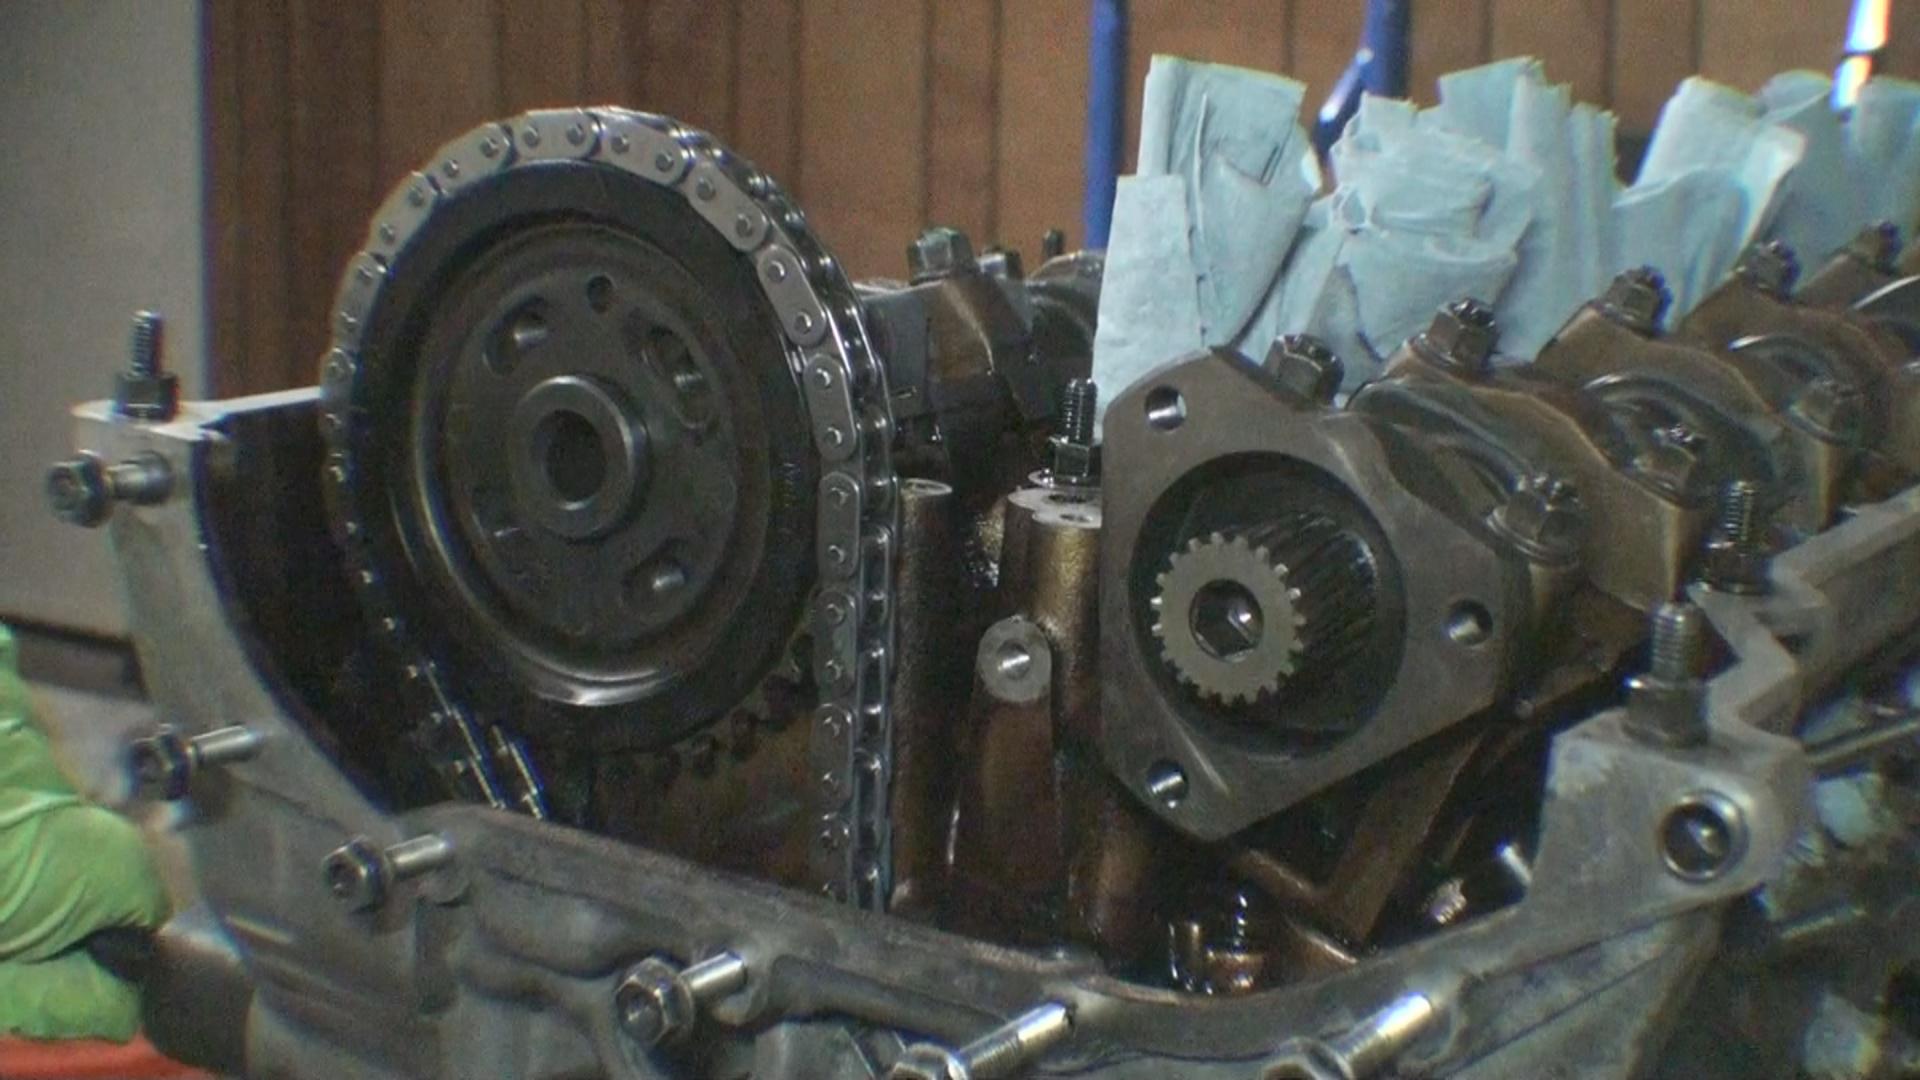 How To Set Timing On A BMW E36 (325i, 328i, & M3) M50TU, M52, S50, Or S52 Engine